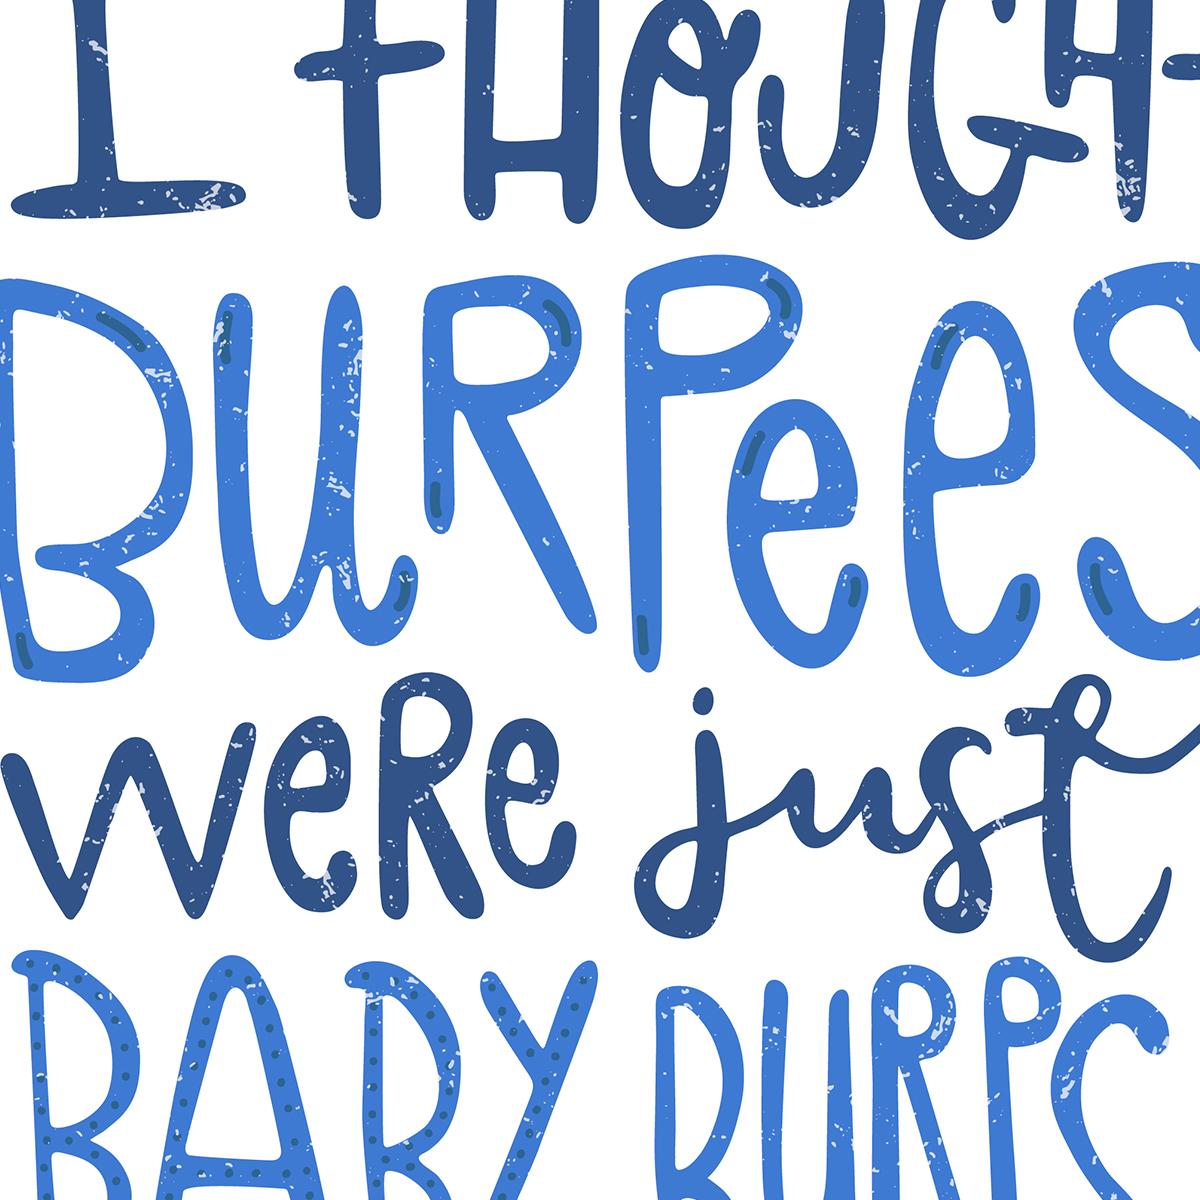 BabyBurps_Cover.jpg